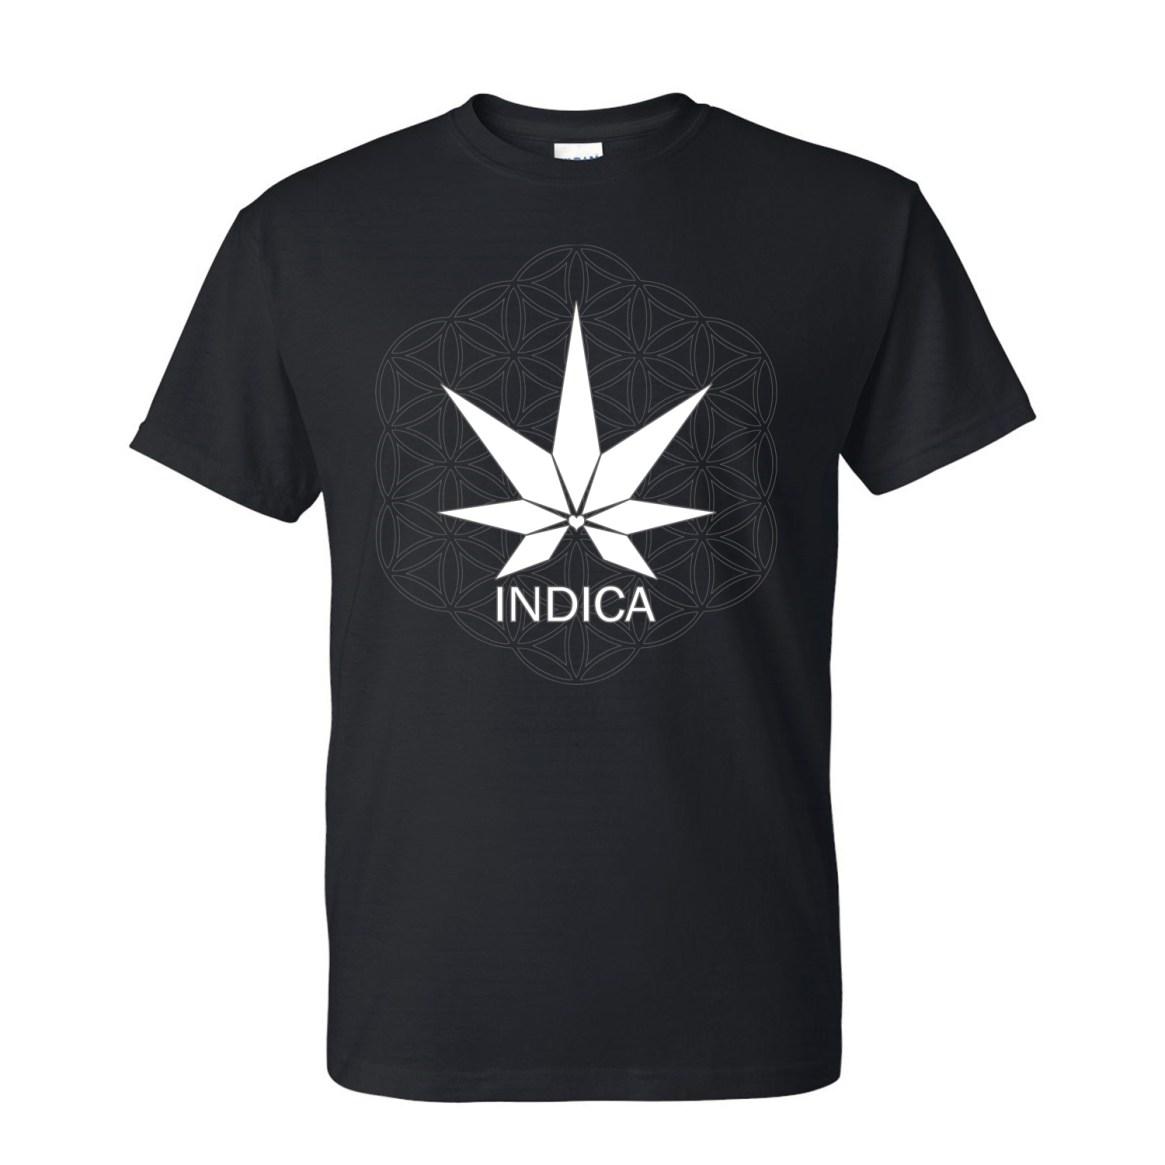 h3mp shirts_INDICA